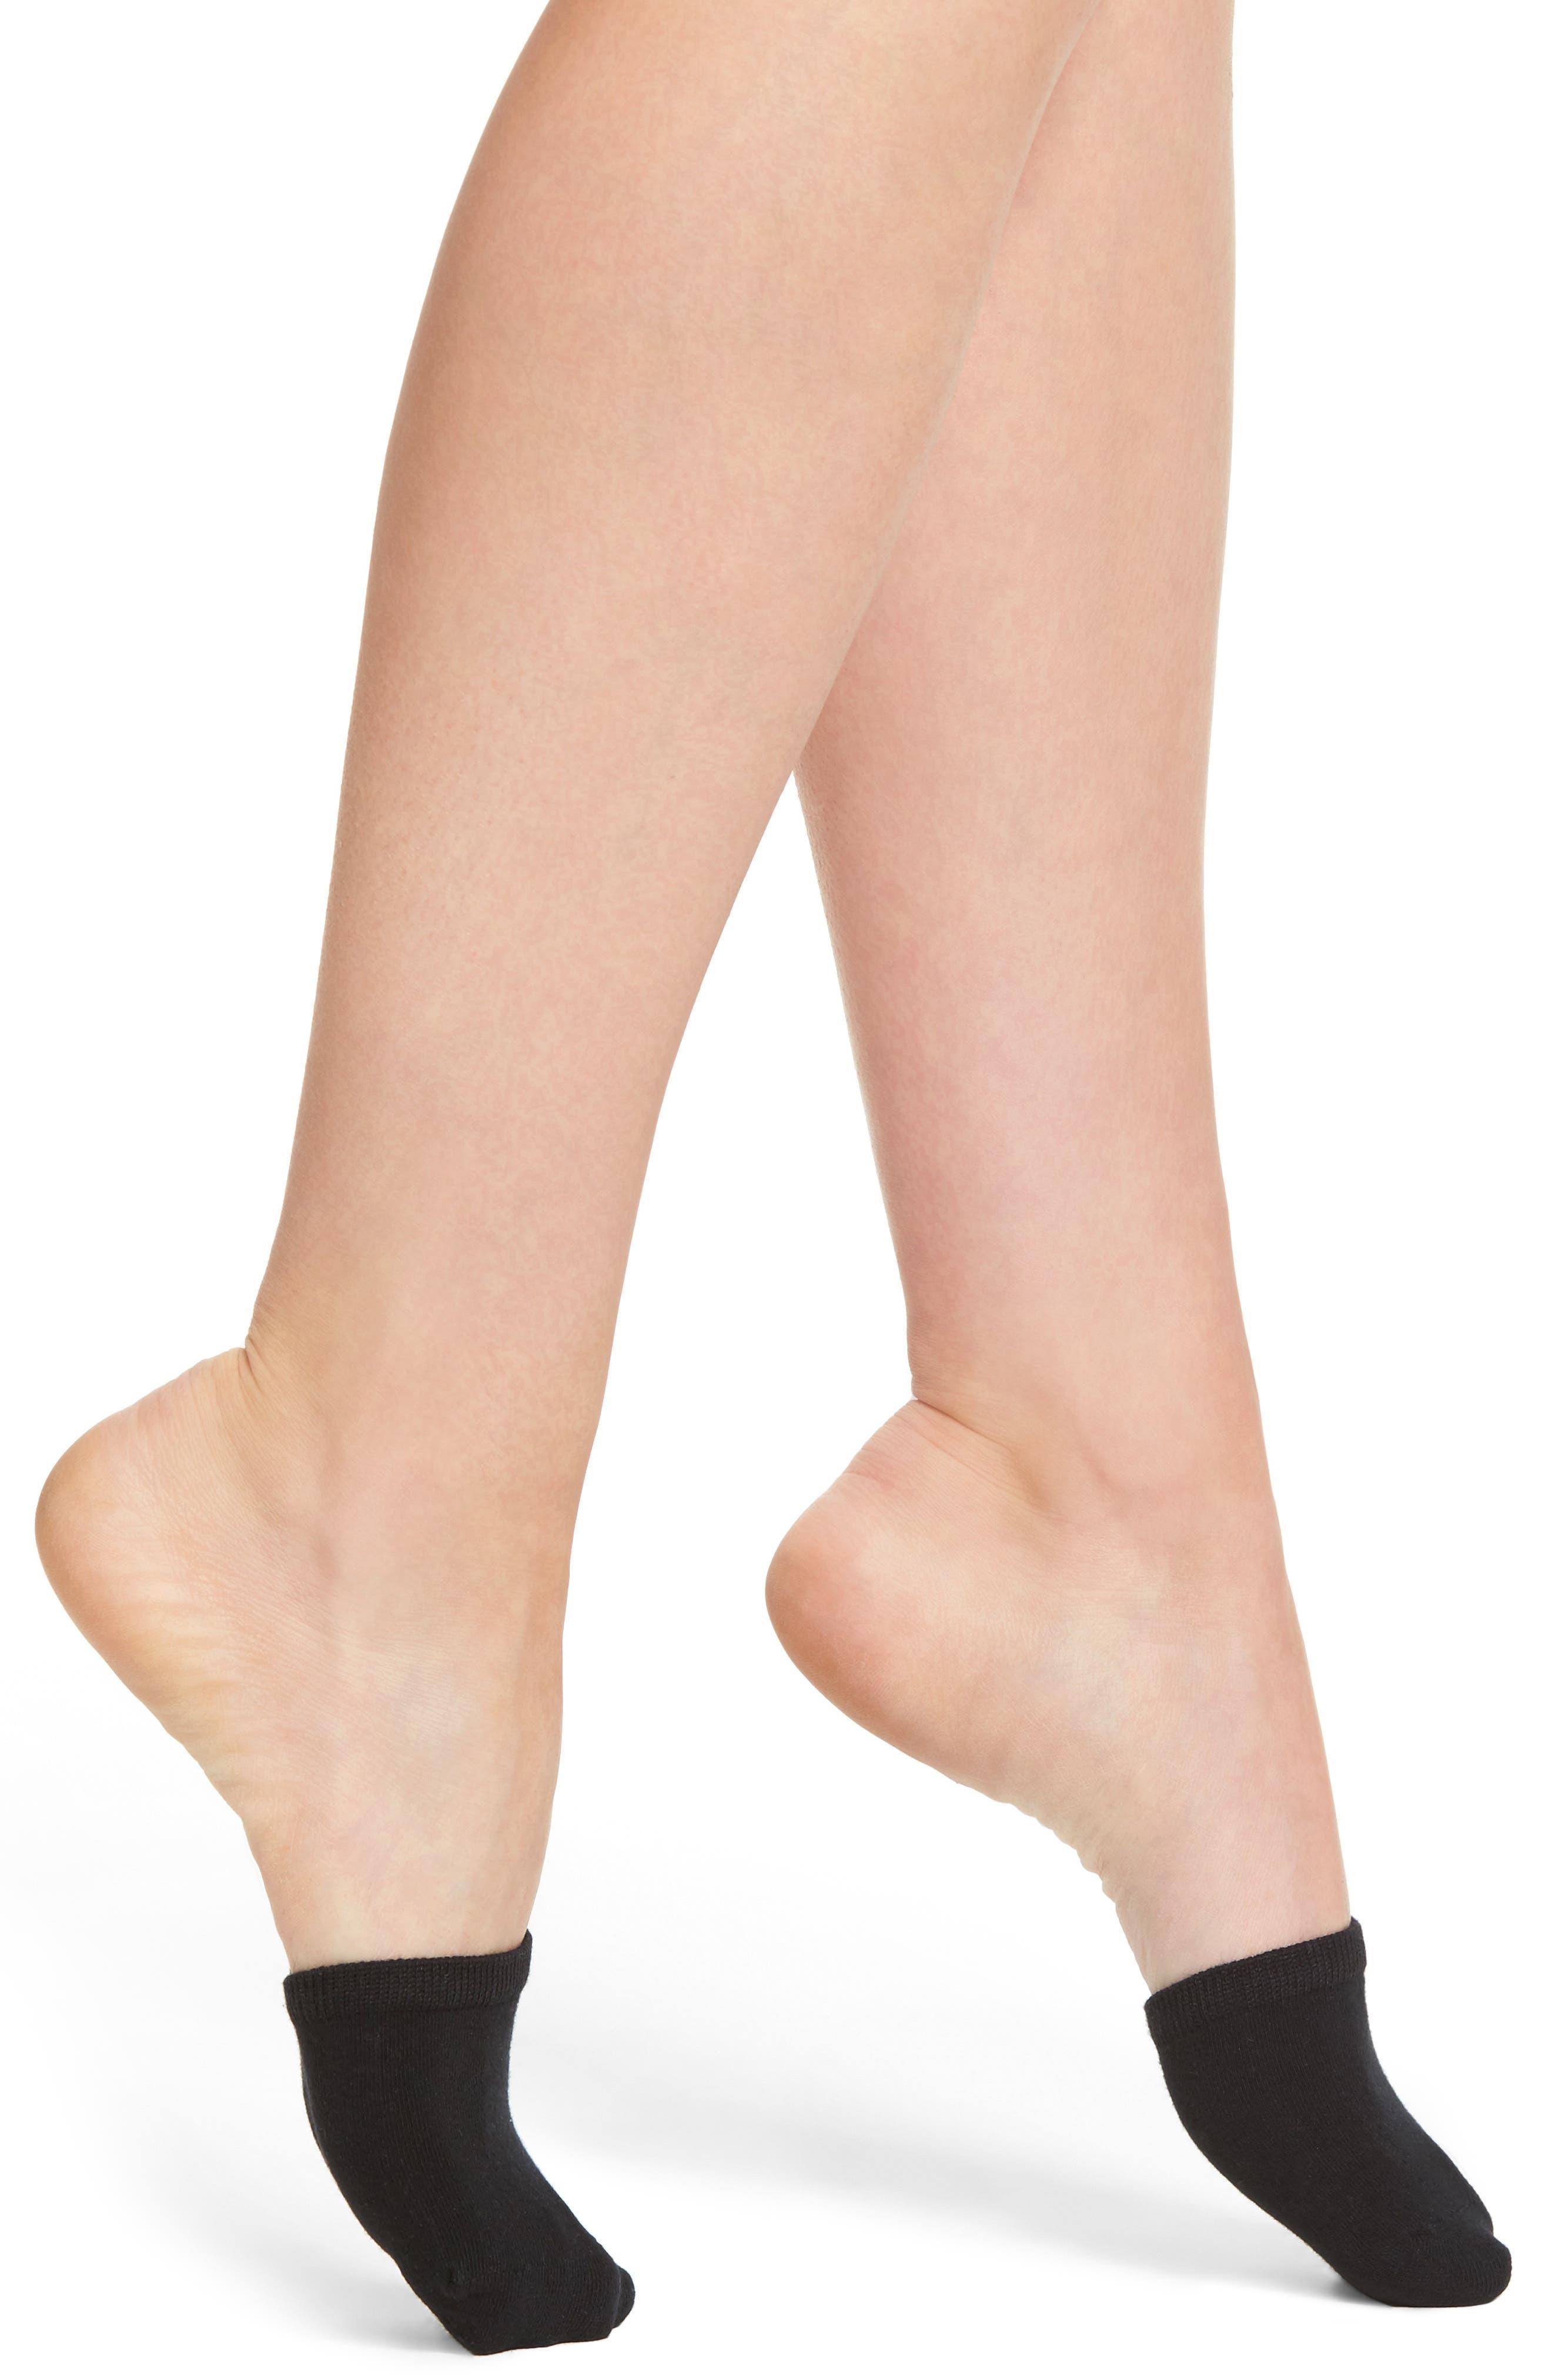 Alternate Image 1 Selected - SOCKART 2-Pack Mule Socks